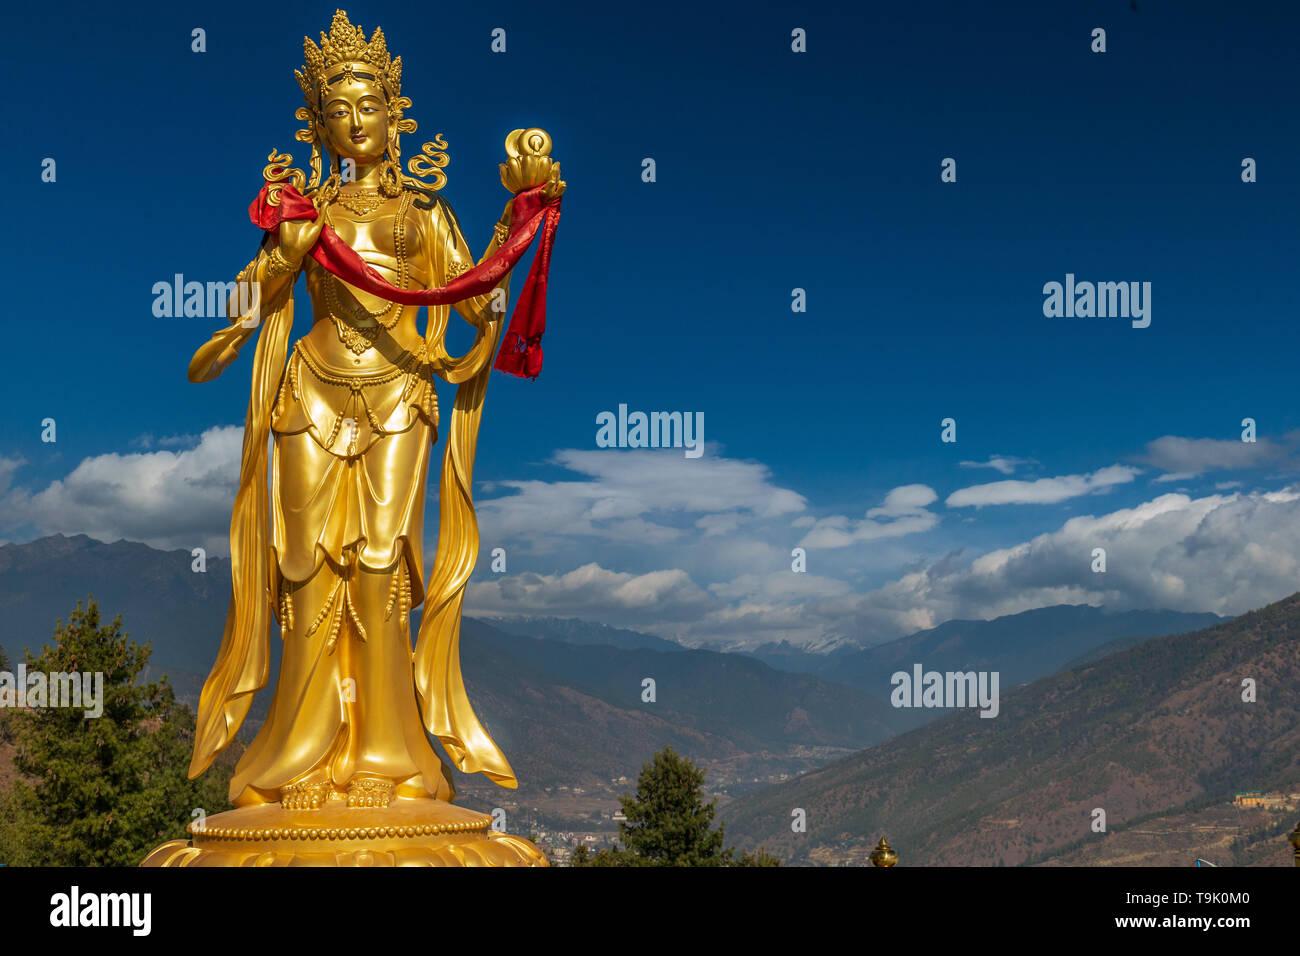 Gilded Bodhisattva statue at the Buddha Dordenma statue - Stock Image